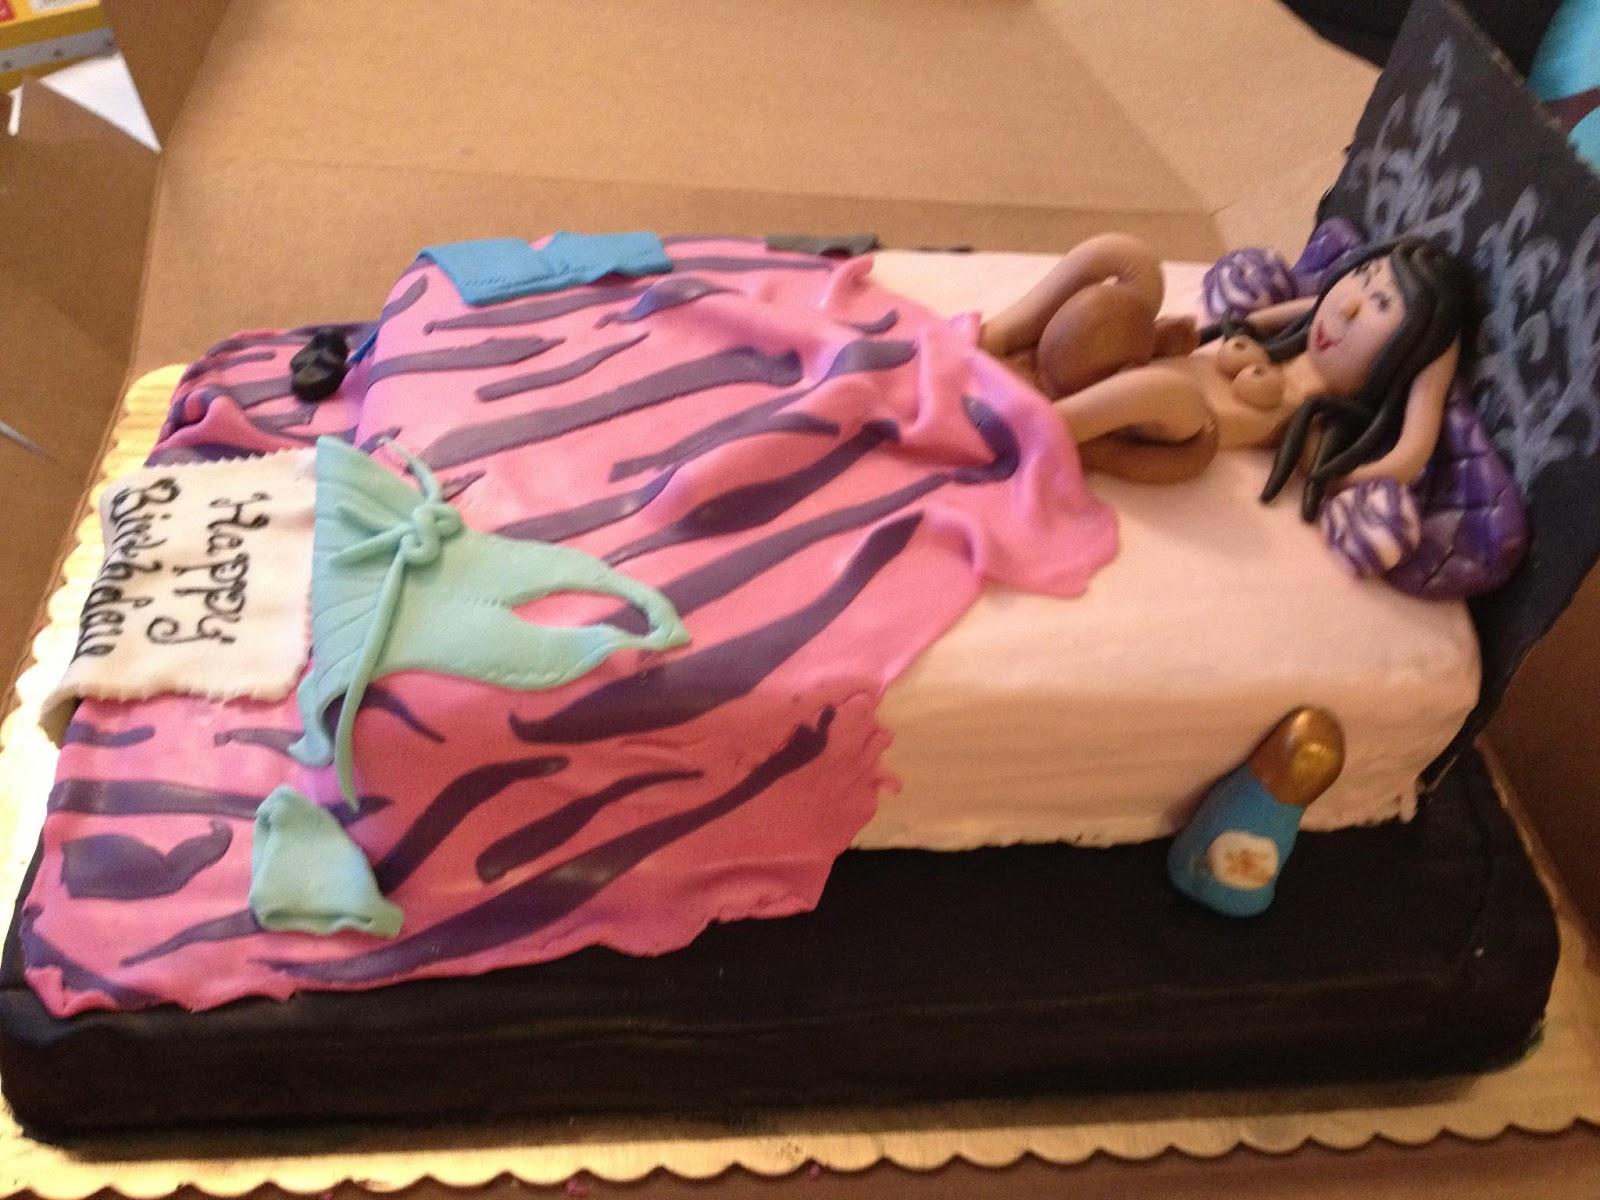 erotic cakes philadelphia pa